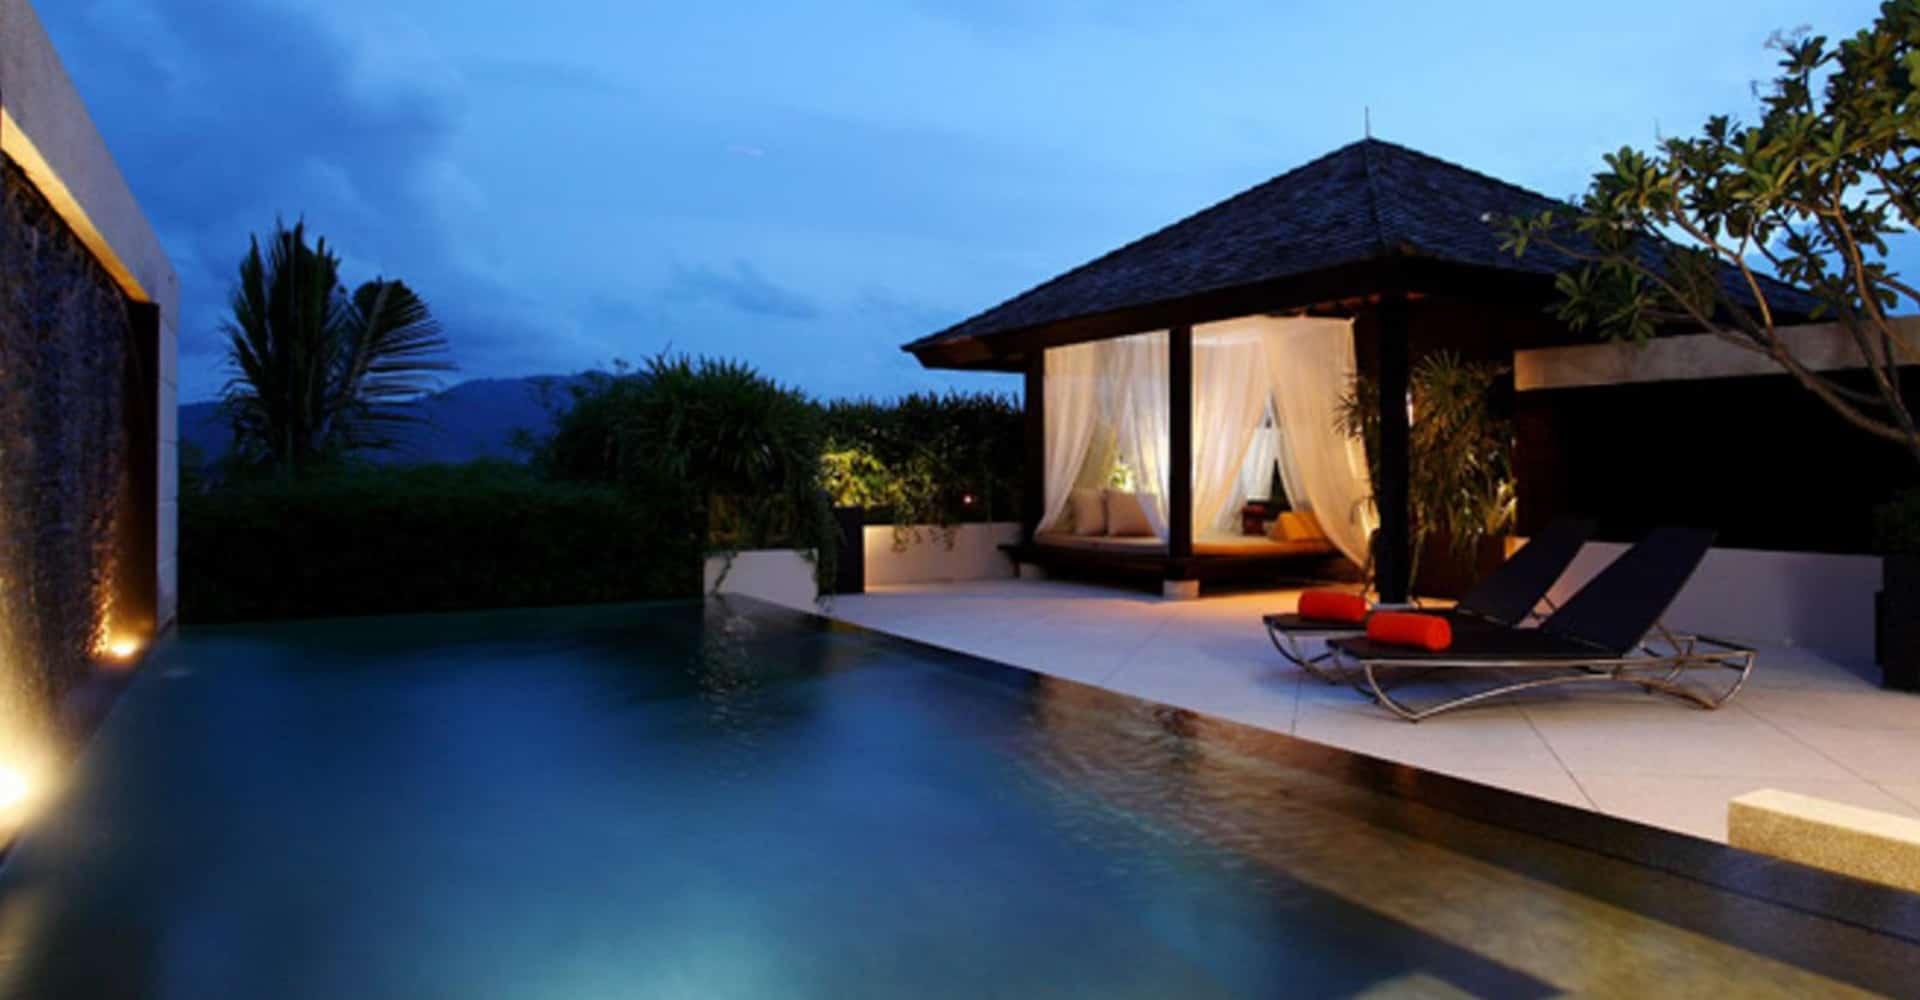 One Bedroom Villas - The Pavilions Phuket